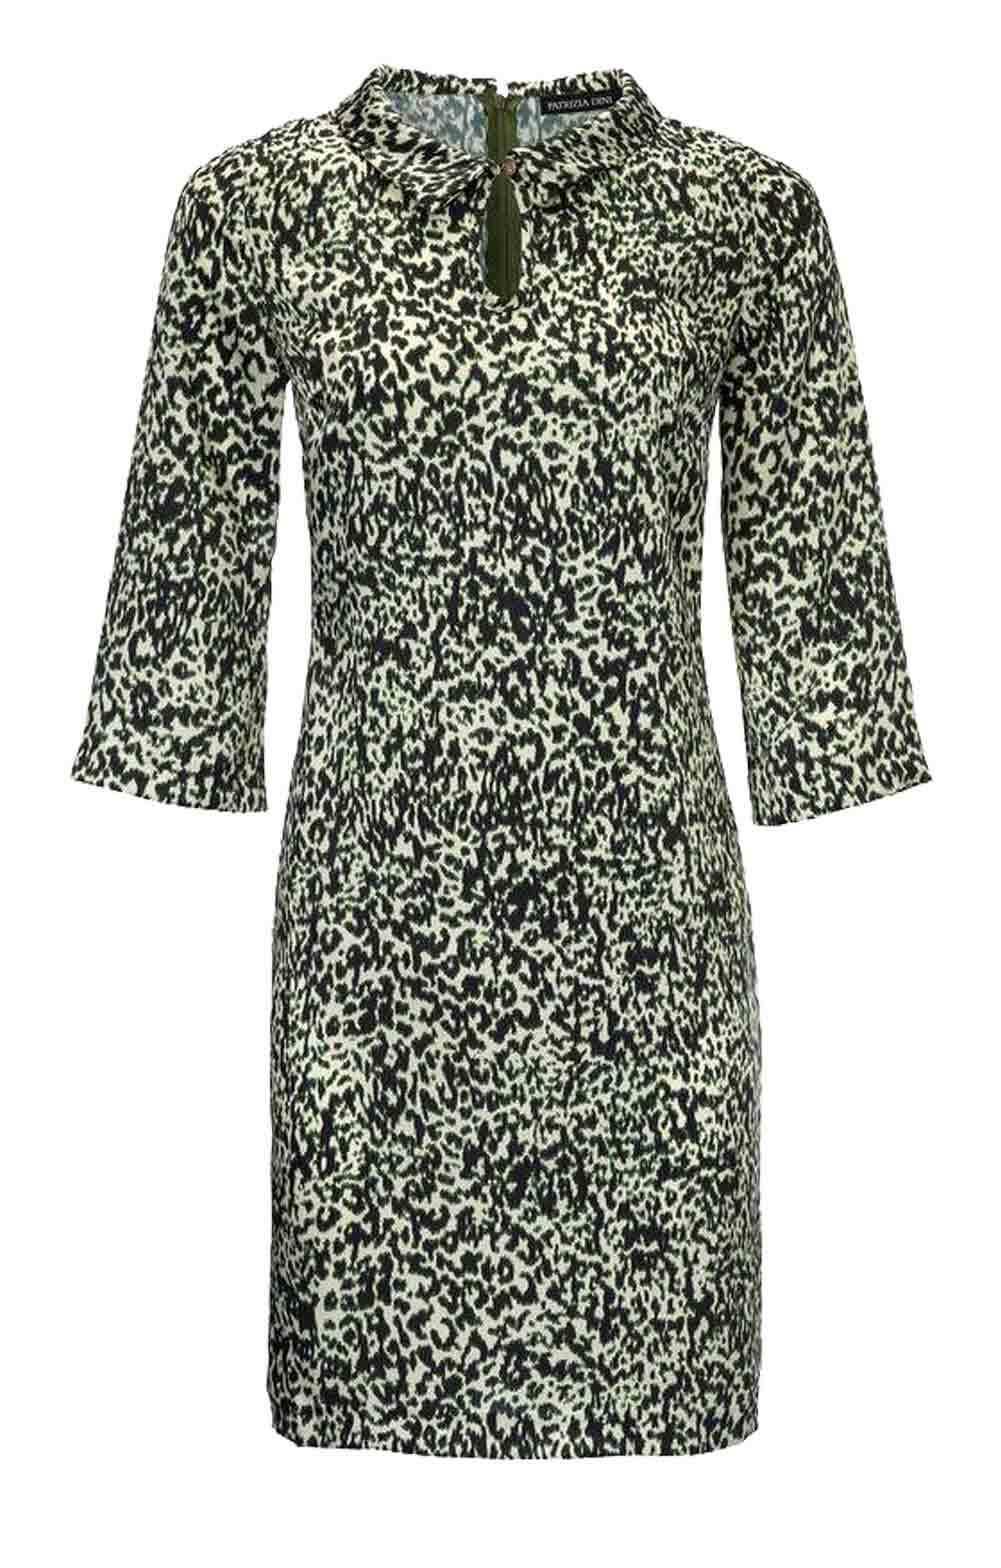 TCJ 007.363 elegantes Kleid Designerkleid  Druckkleid Sommerkleid grün bunt